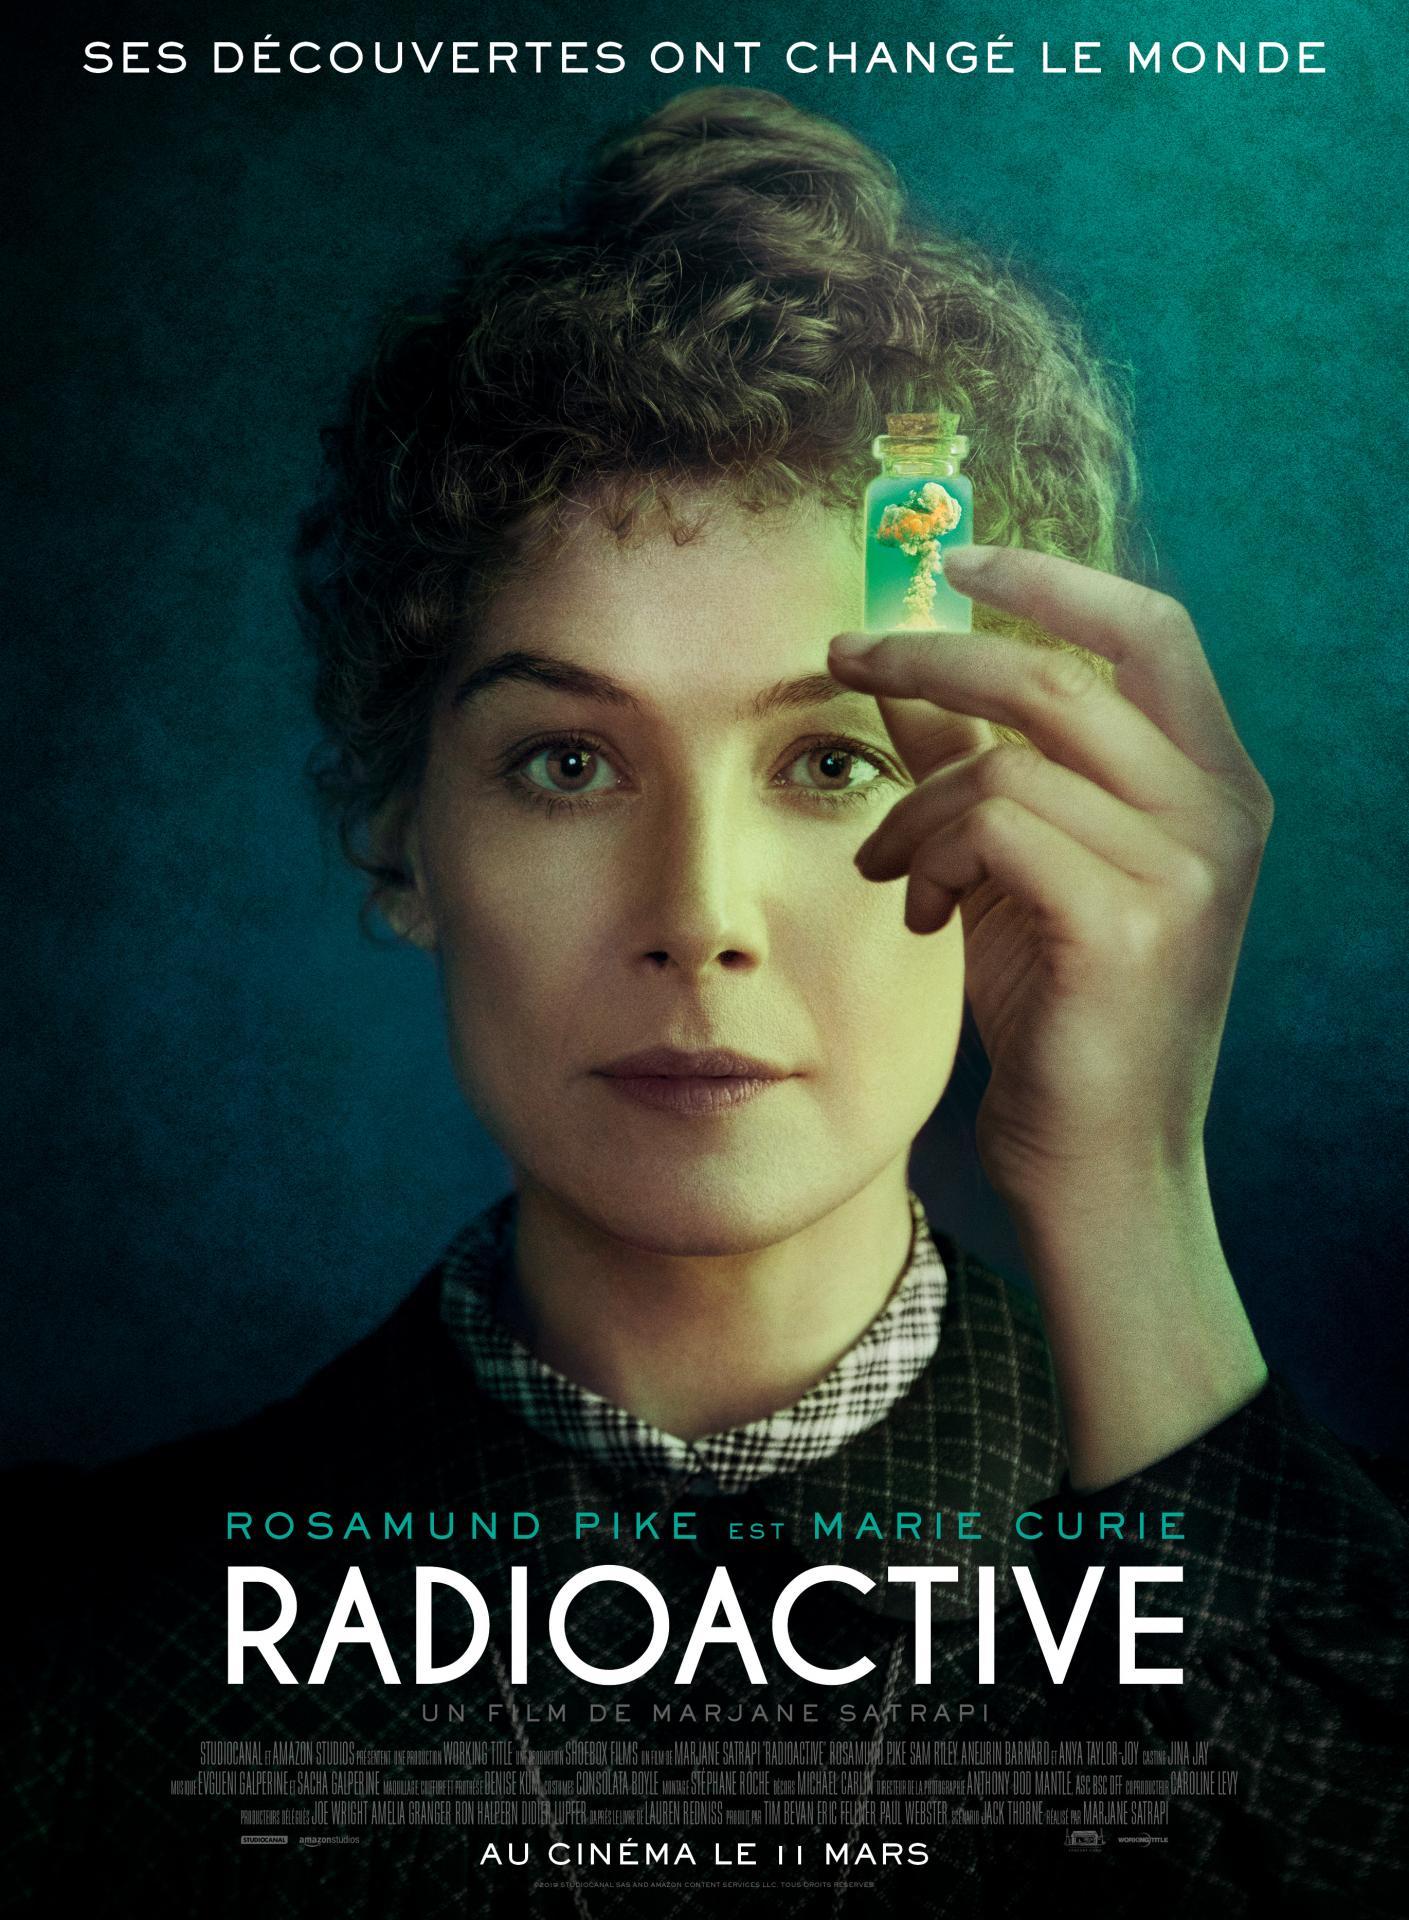 Rendez-vous avec Radioactive.